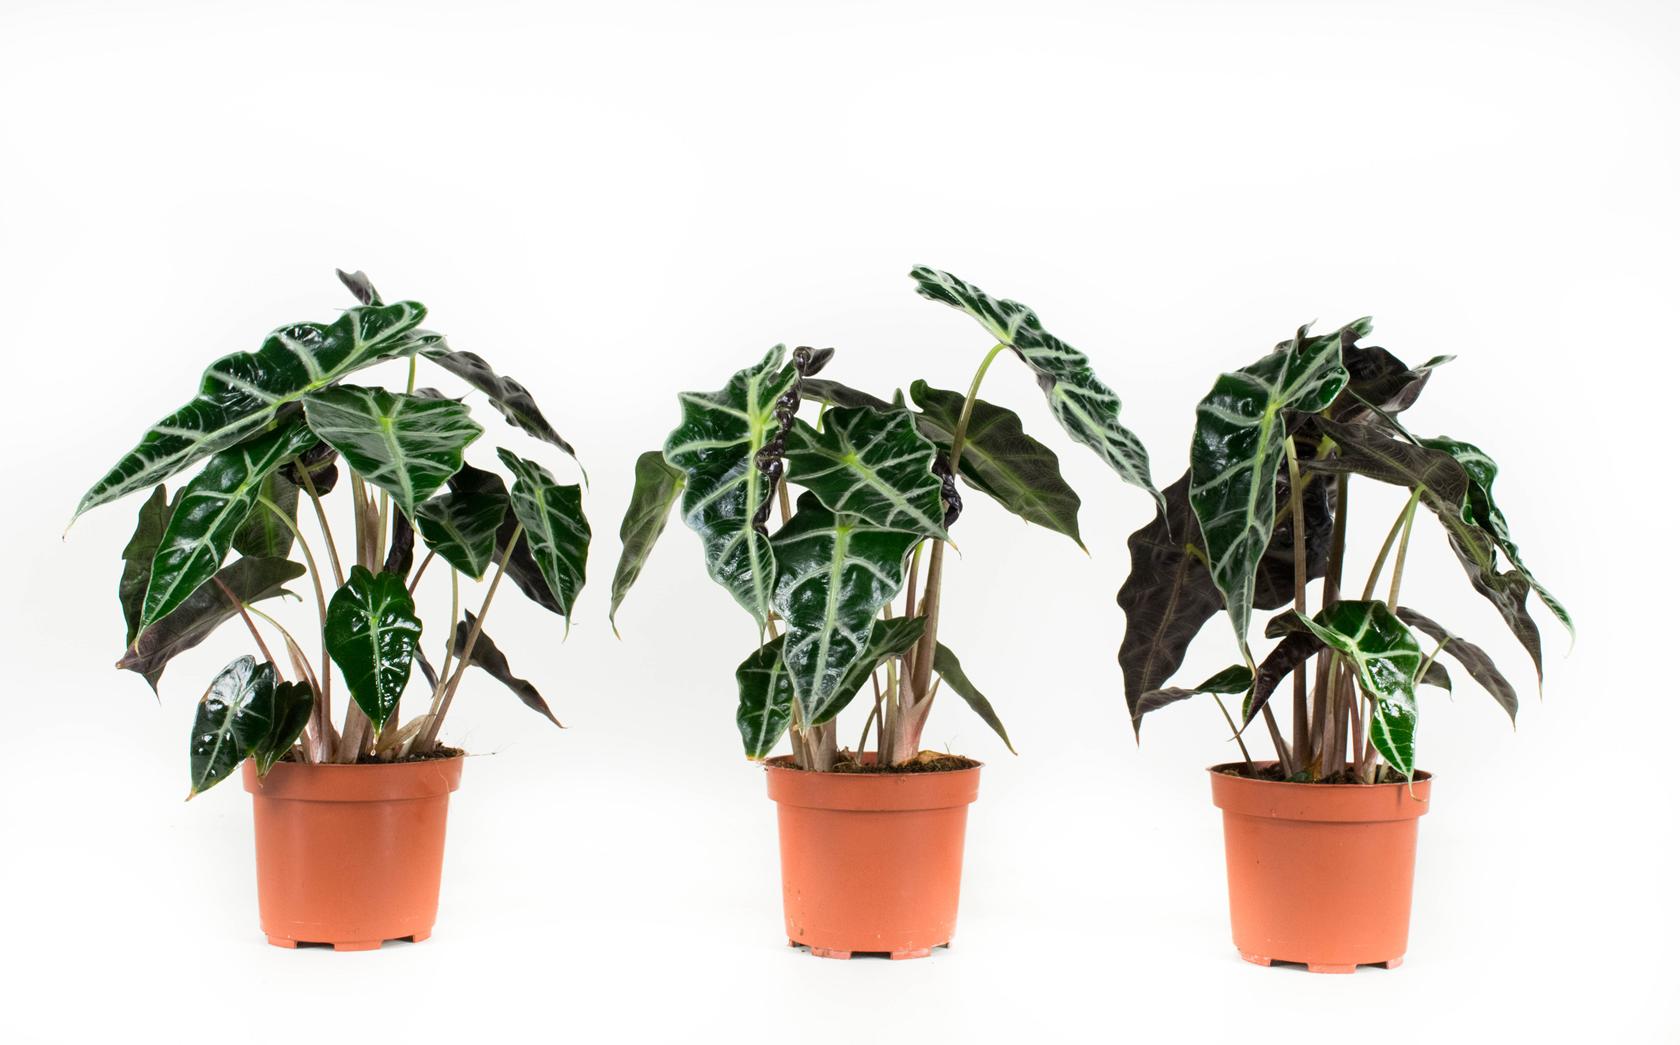 3 stuks Olifantsoor of Skeletplant - Alocasia Polly 30cm hoog